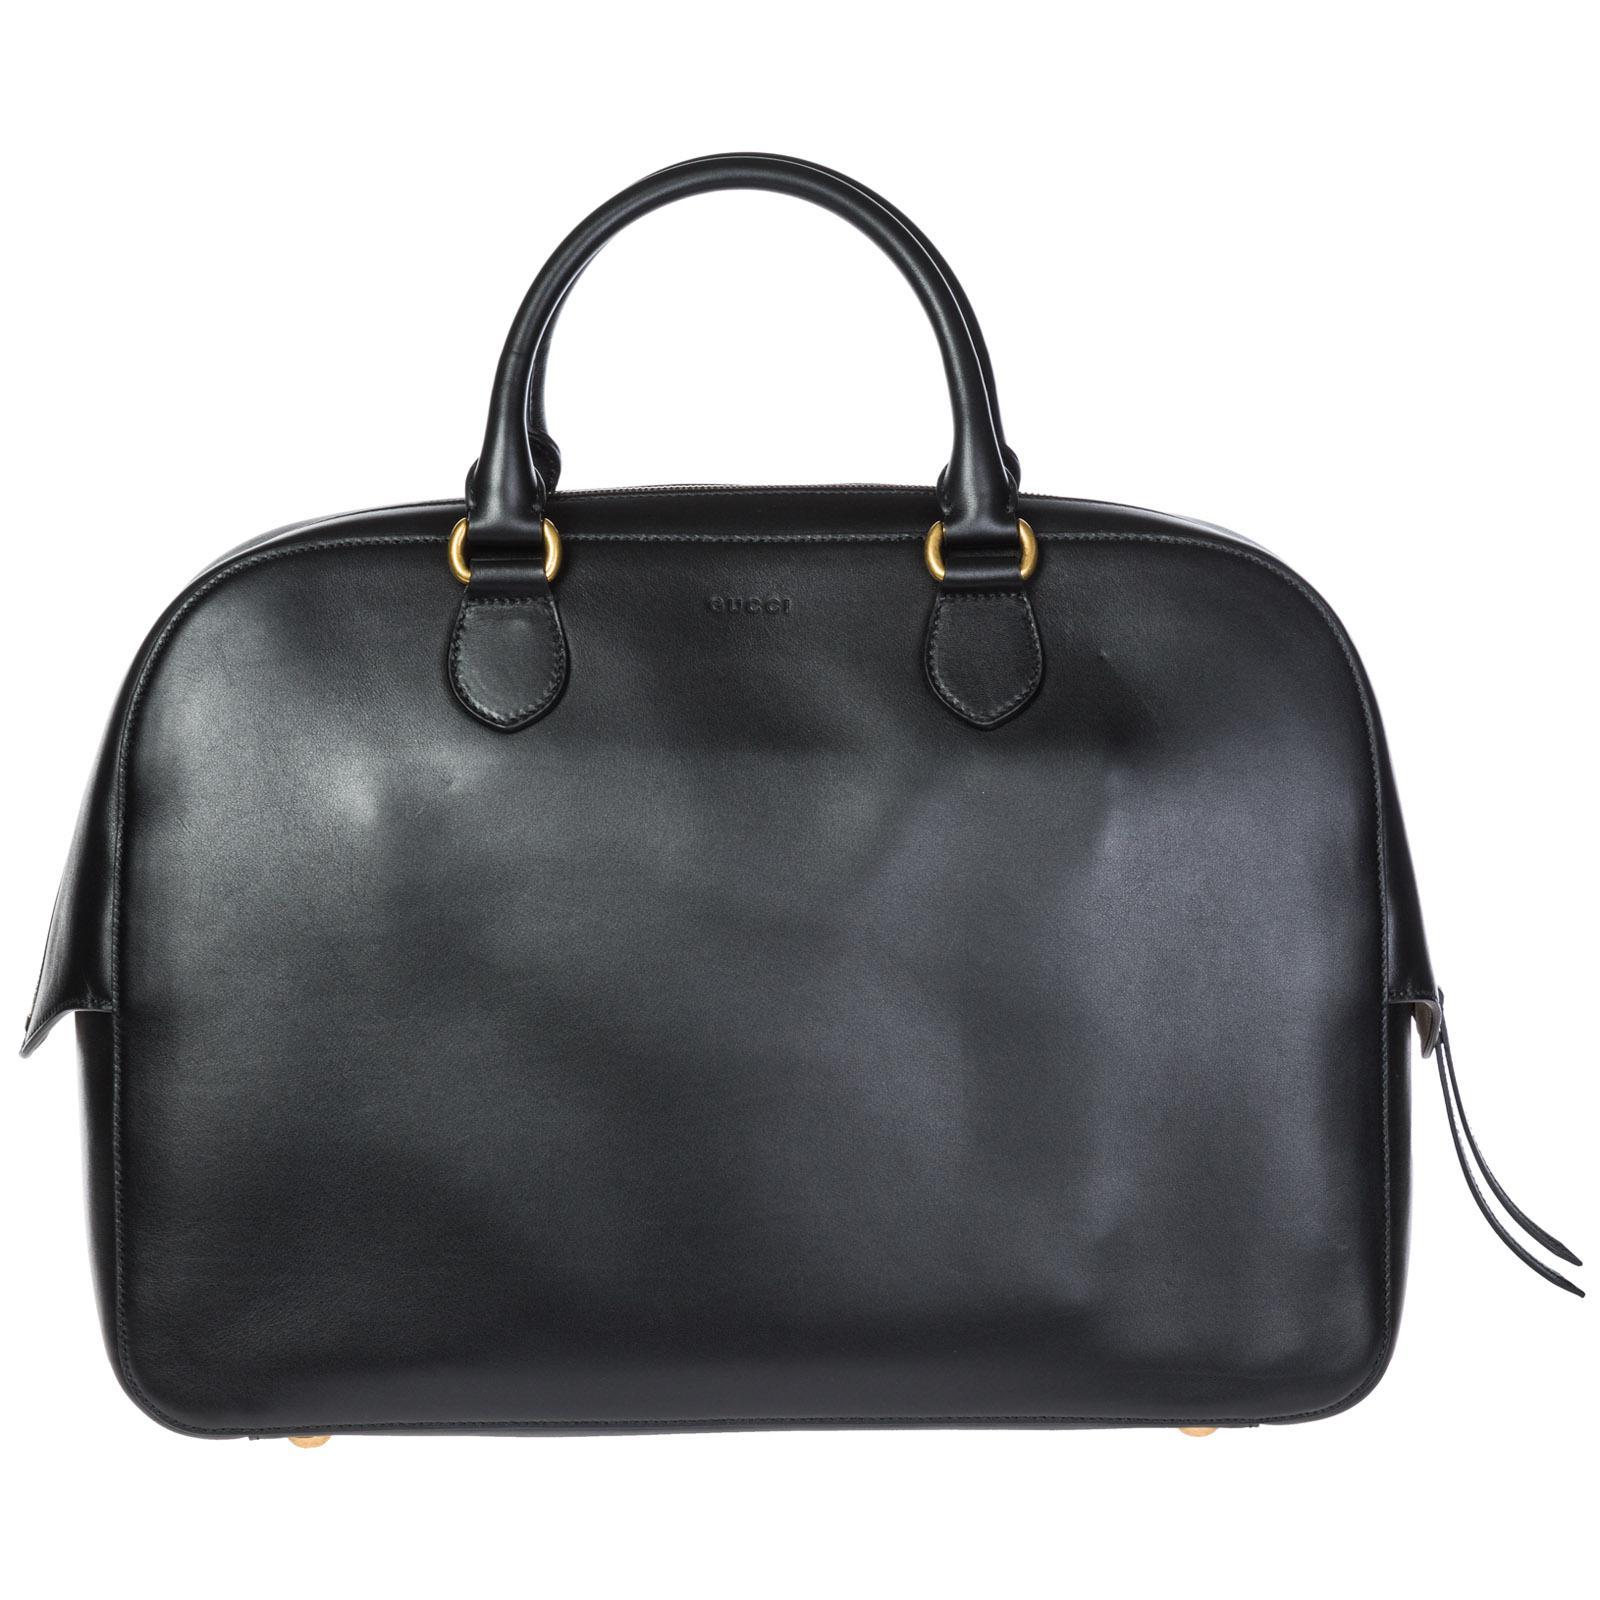 02d9d1ebe93c6 Gucci Borsa Uomo A Mano In Pelle Bestiary in Black for Men - Lyst